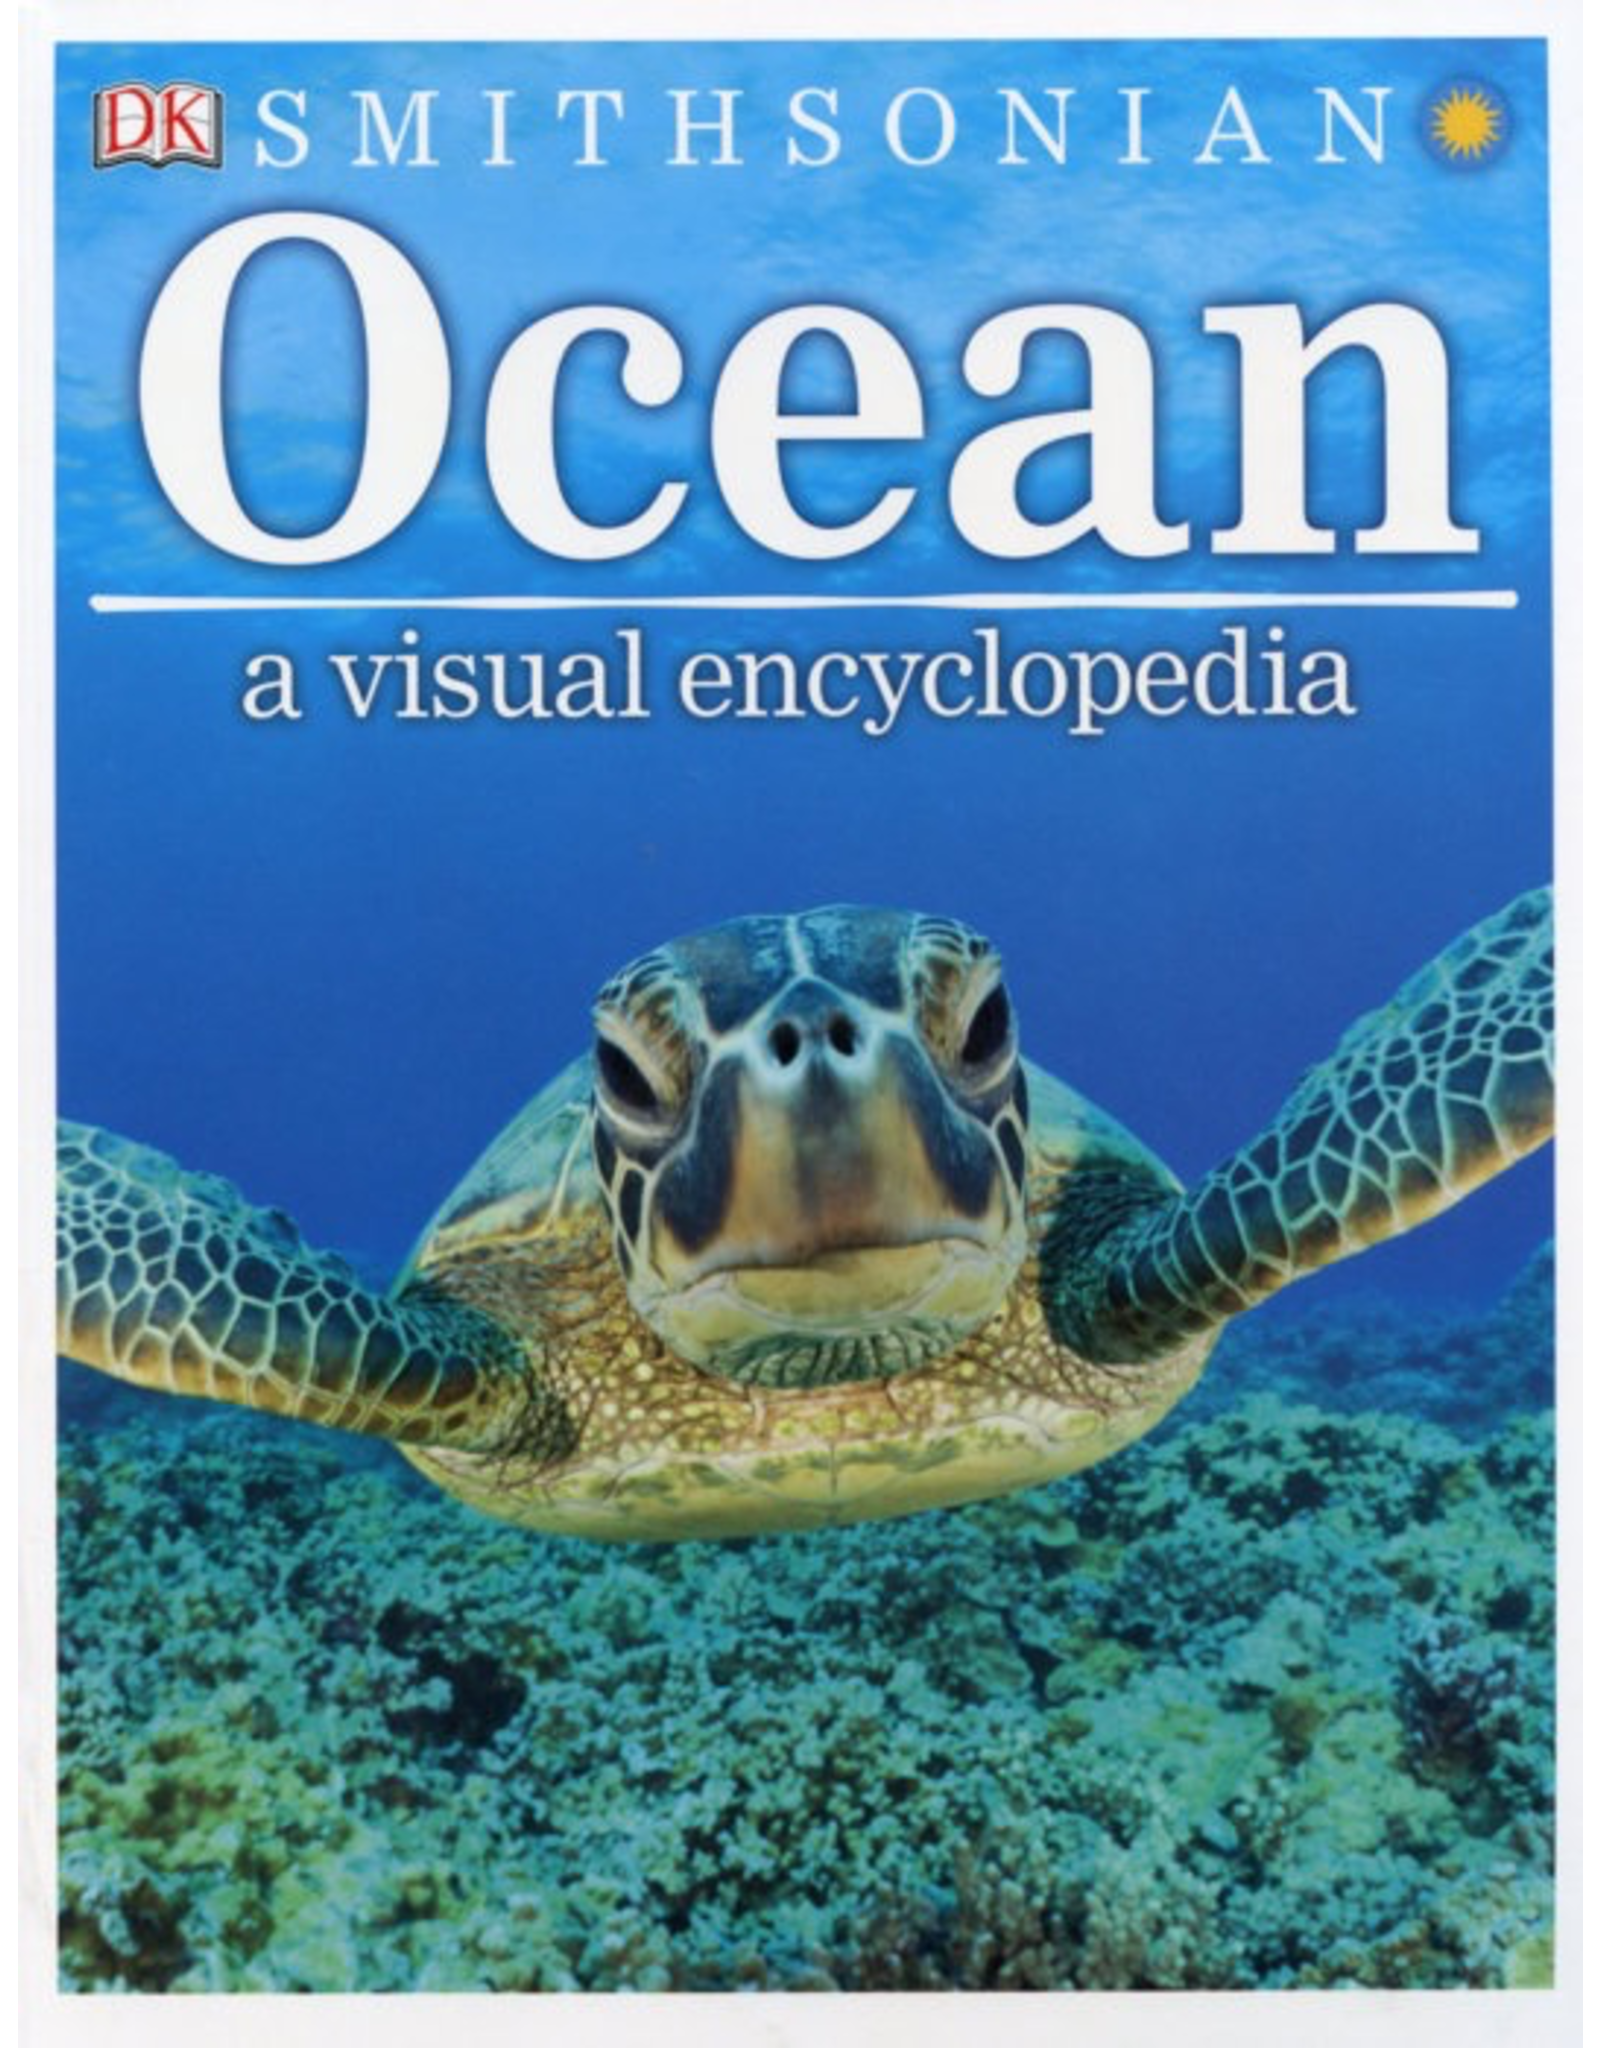 DK A VISUAL ENCYCLOPEDIA - OCEAN